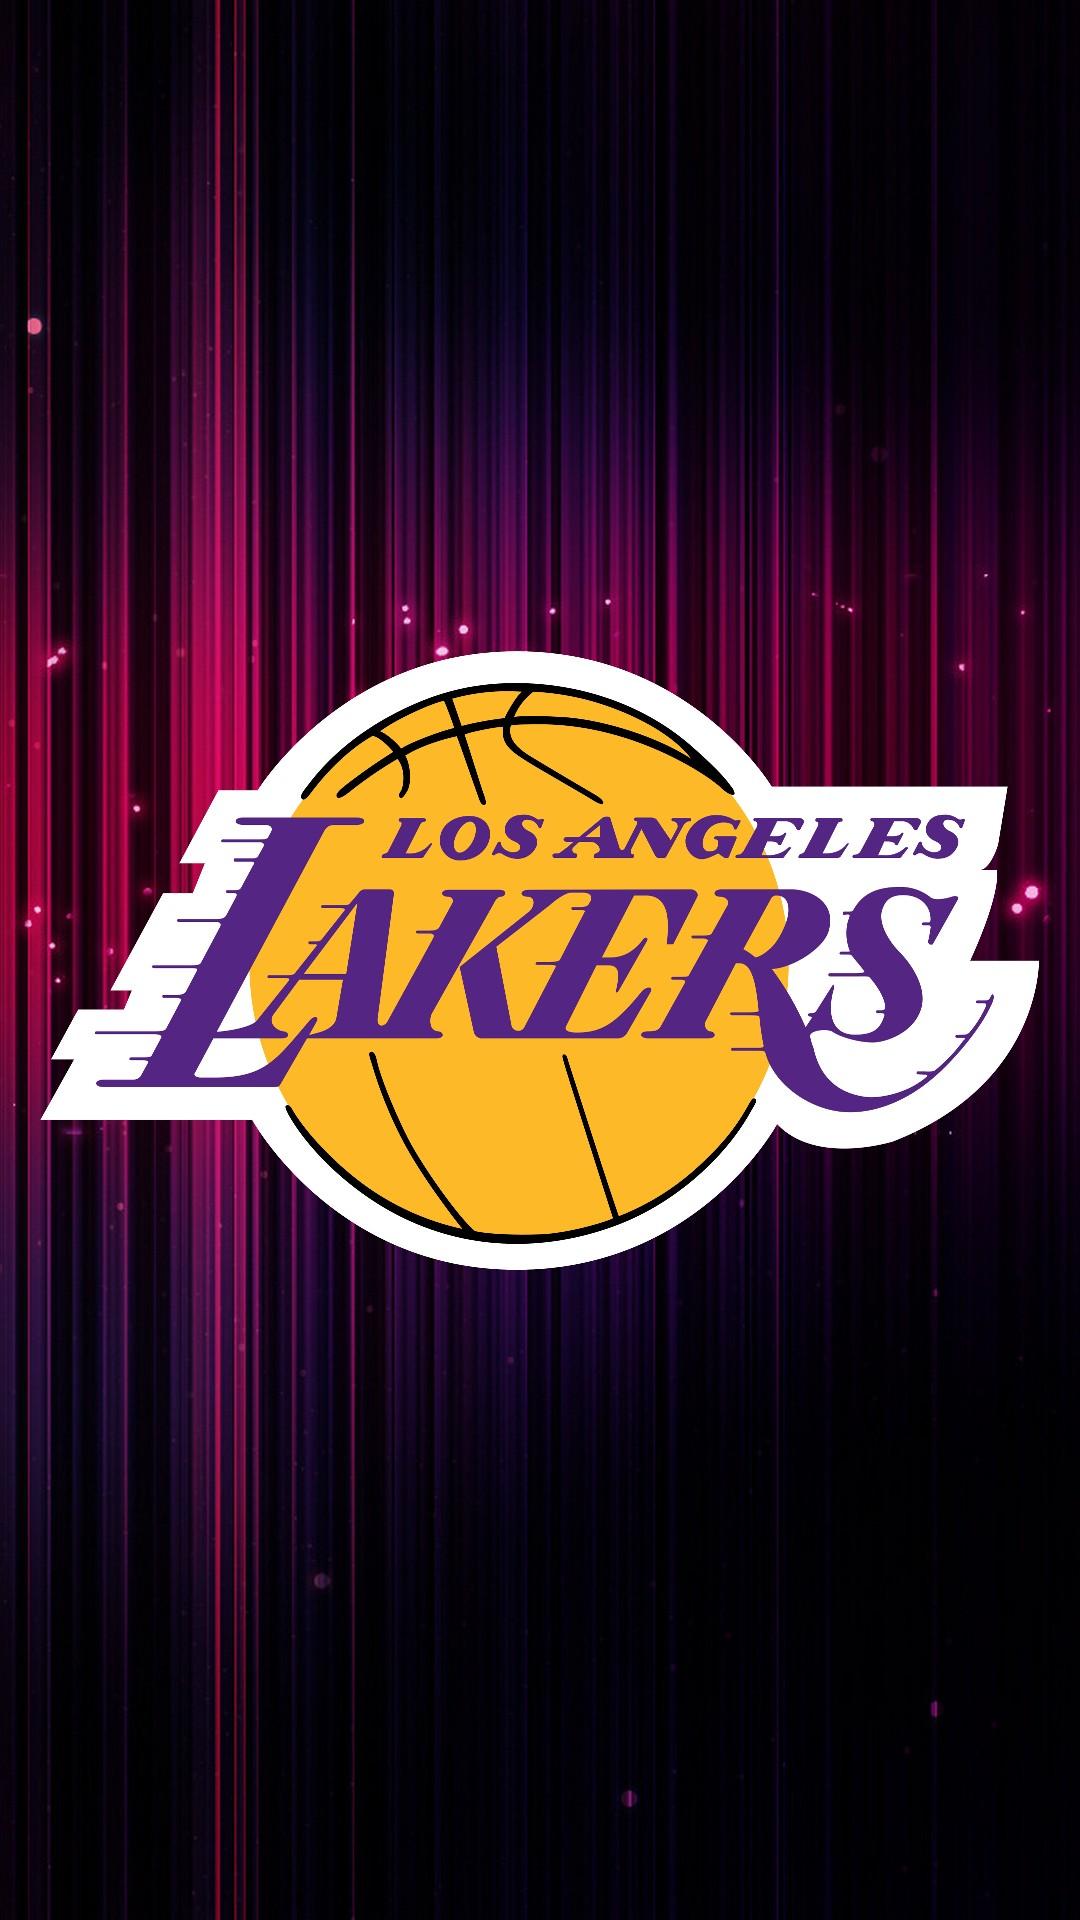 LA Lakers iPhone Home Screen Wallpaper   2020 NBA iPhone Wallpaper 1080x1920